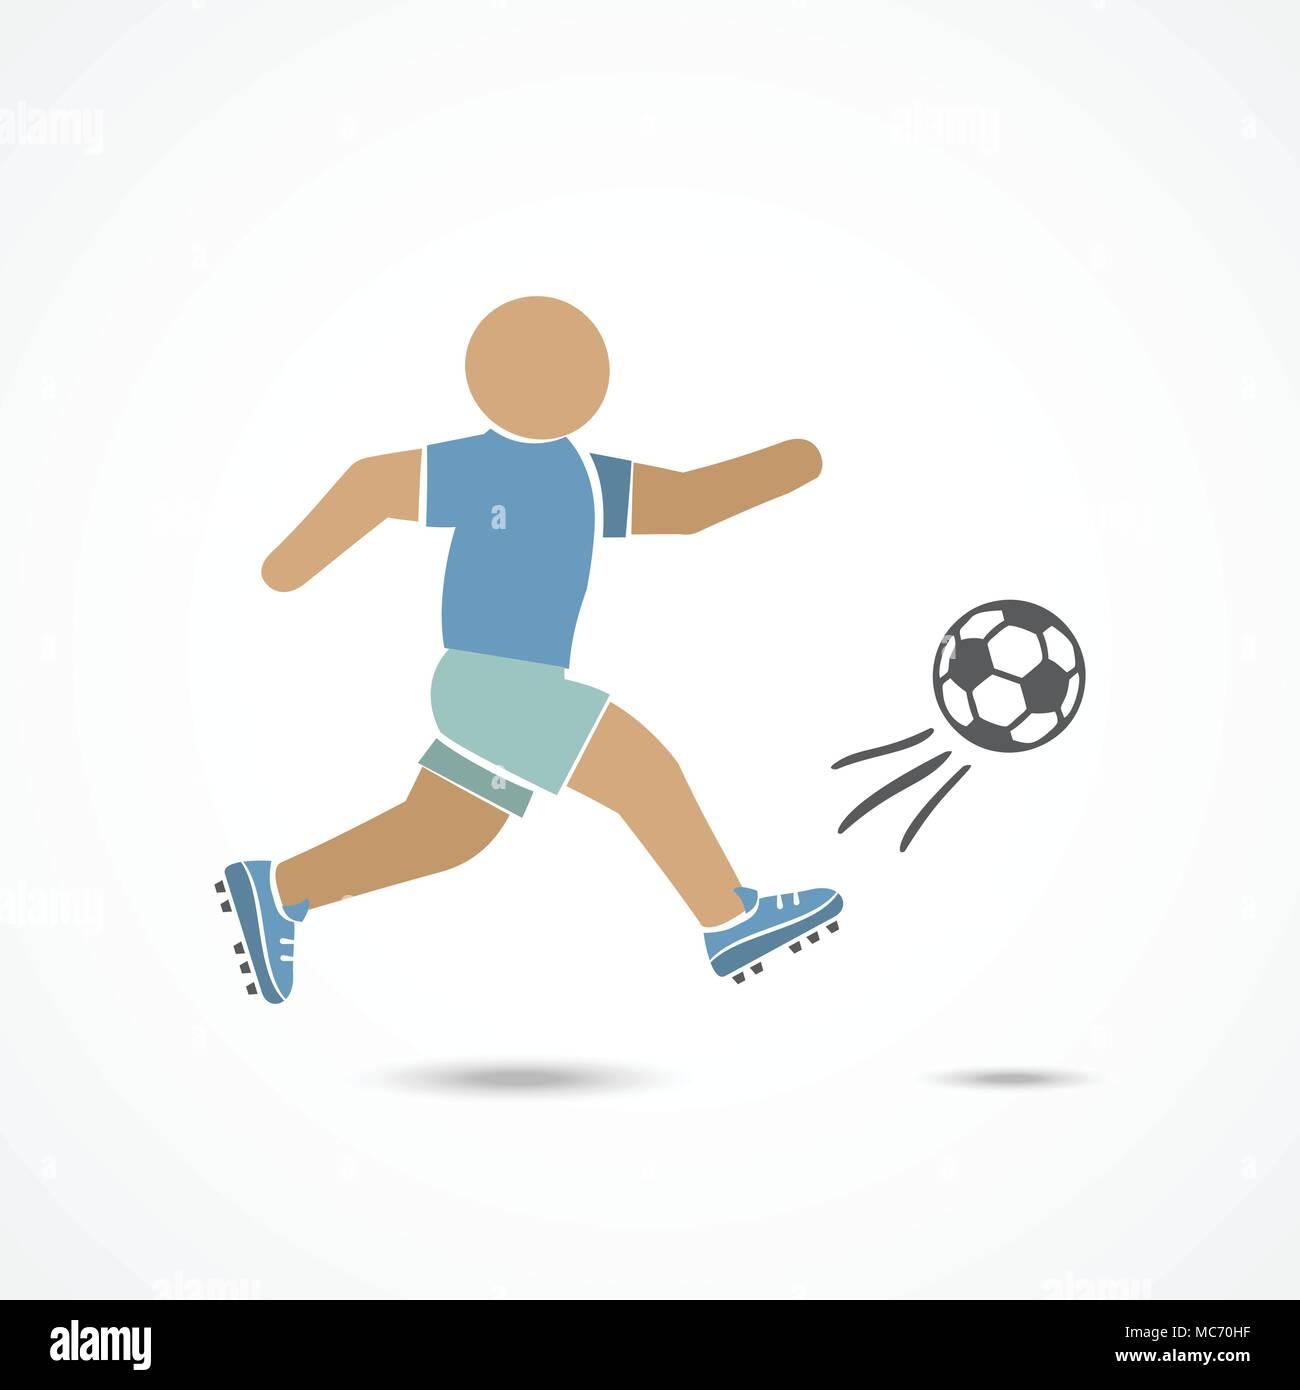 Soccer player illustration - Stock Image